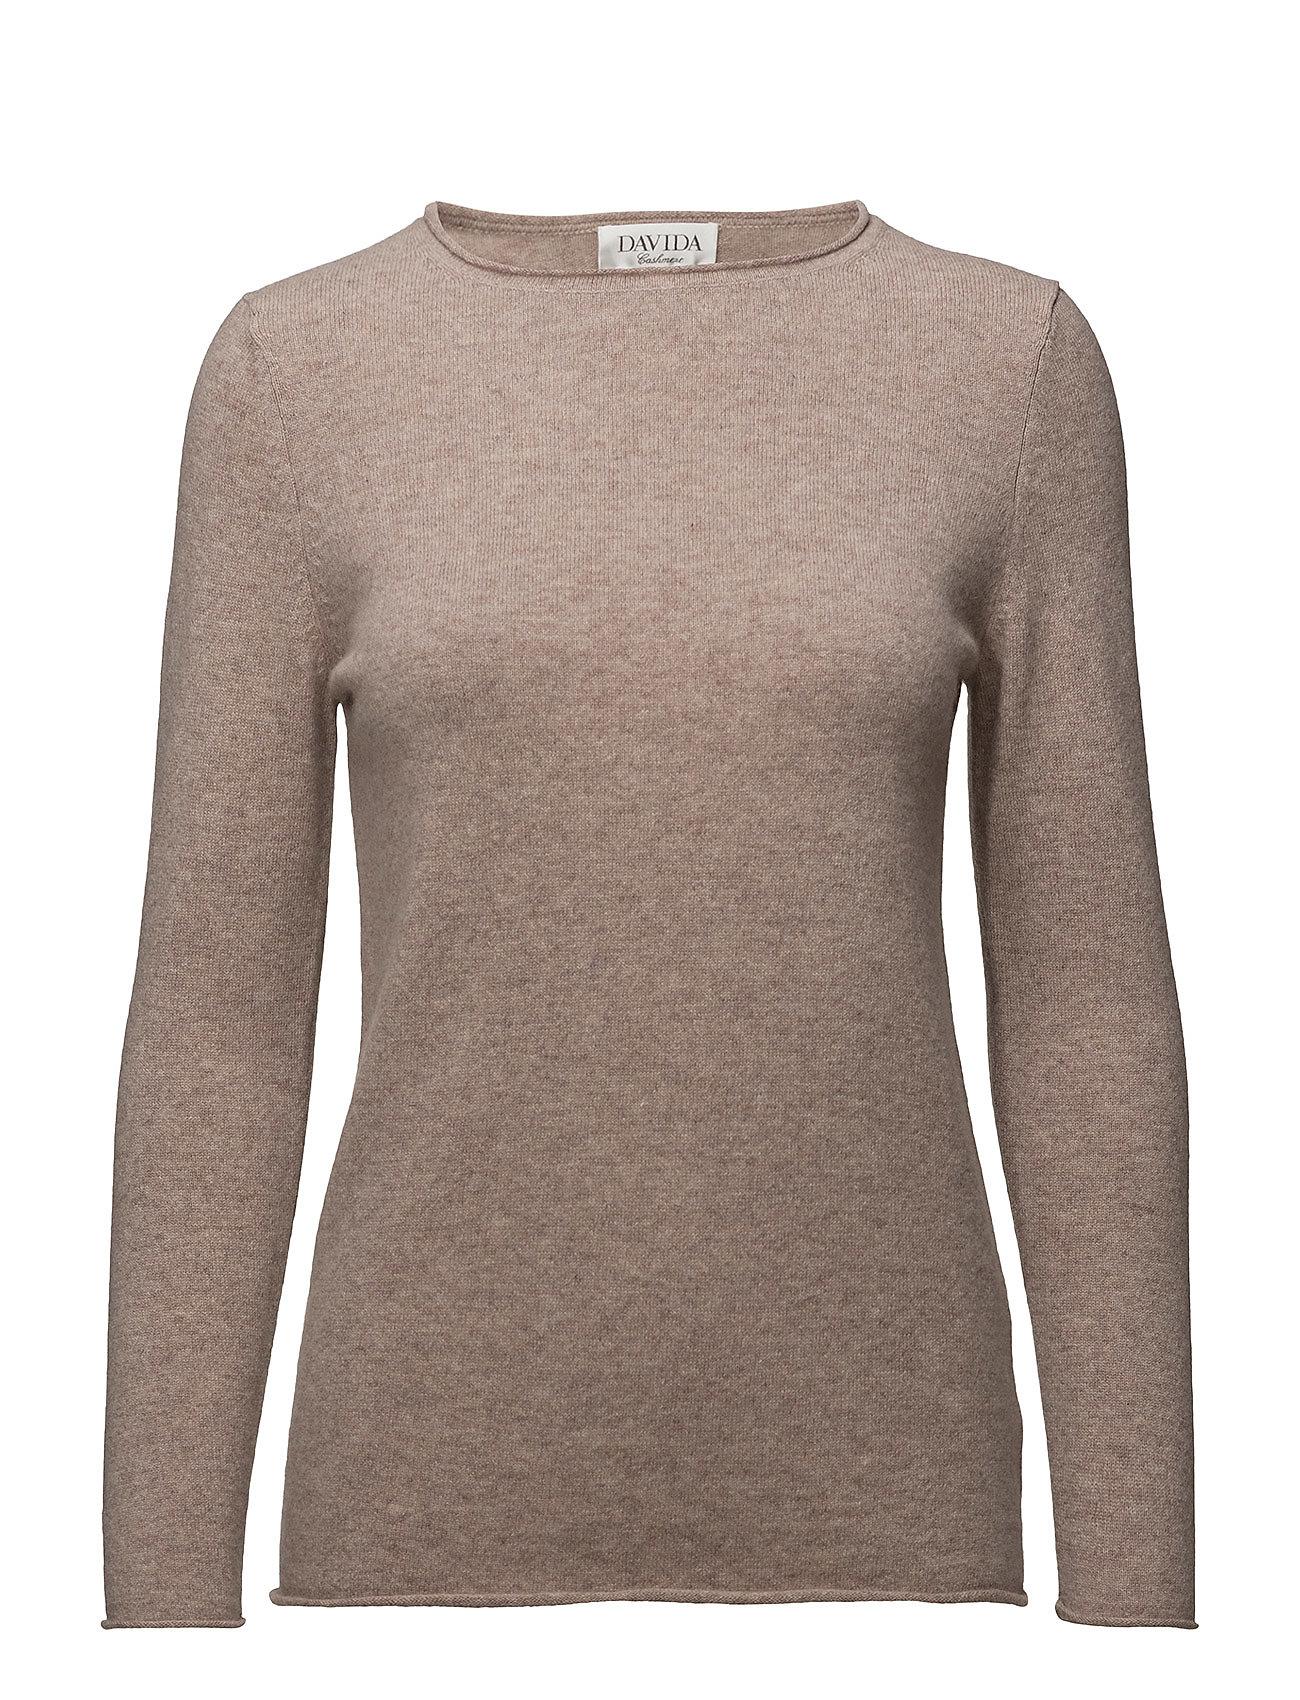 davida cashmere – Raw edge sweater på boozt.com dk